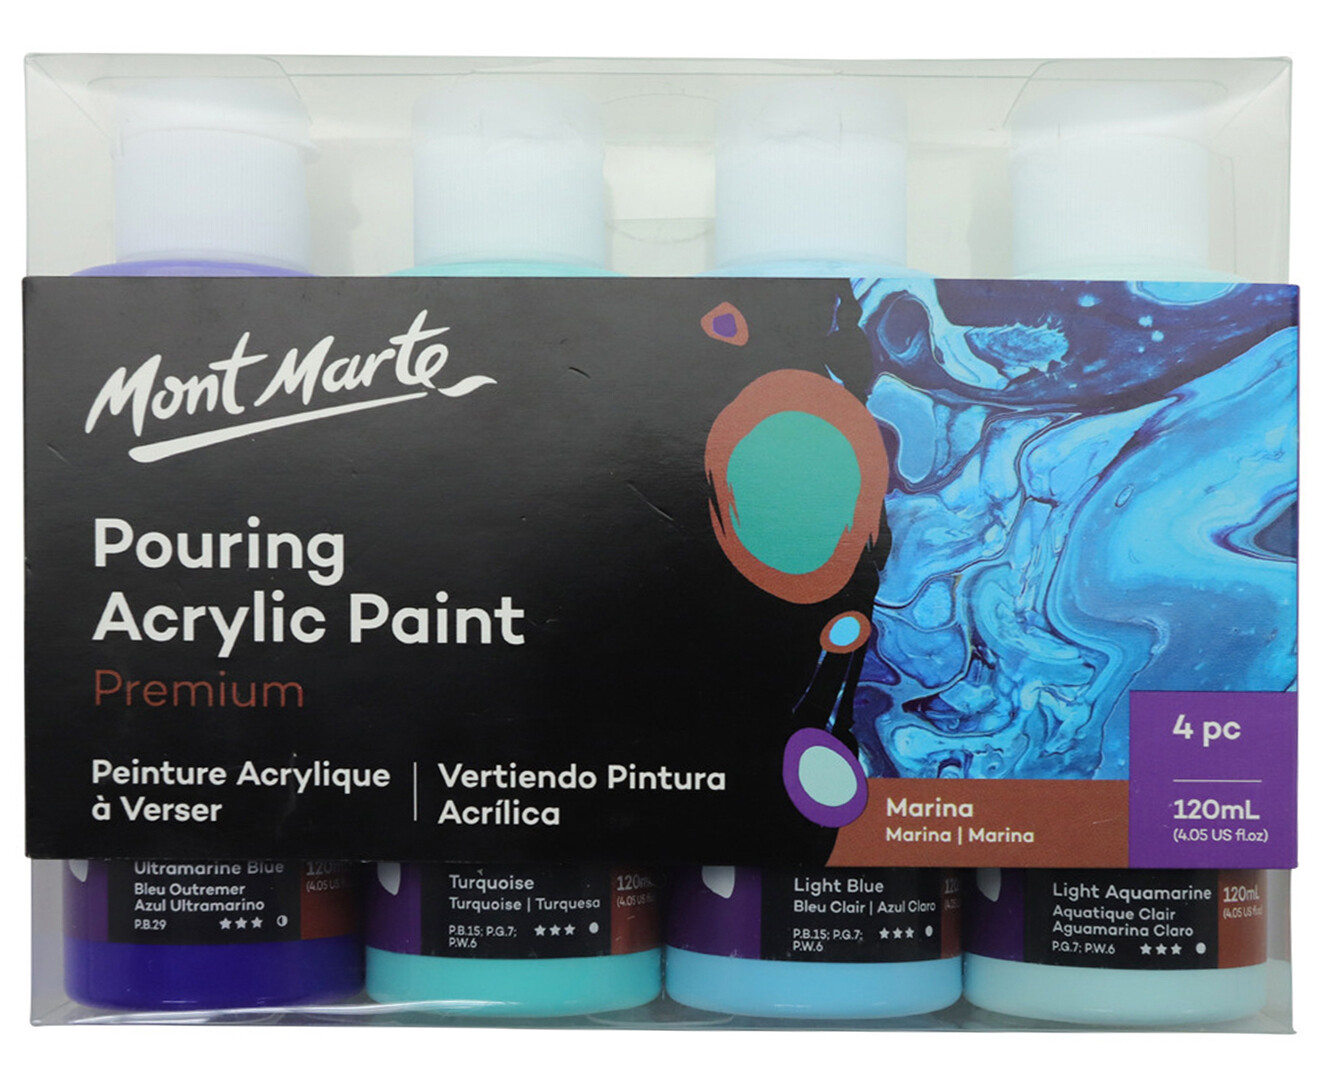 4pc Acrylic Pouring Paint set 60ml